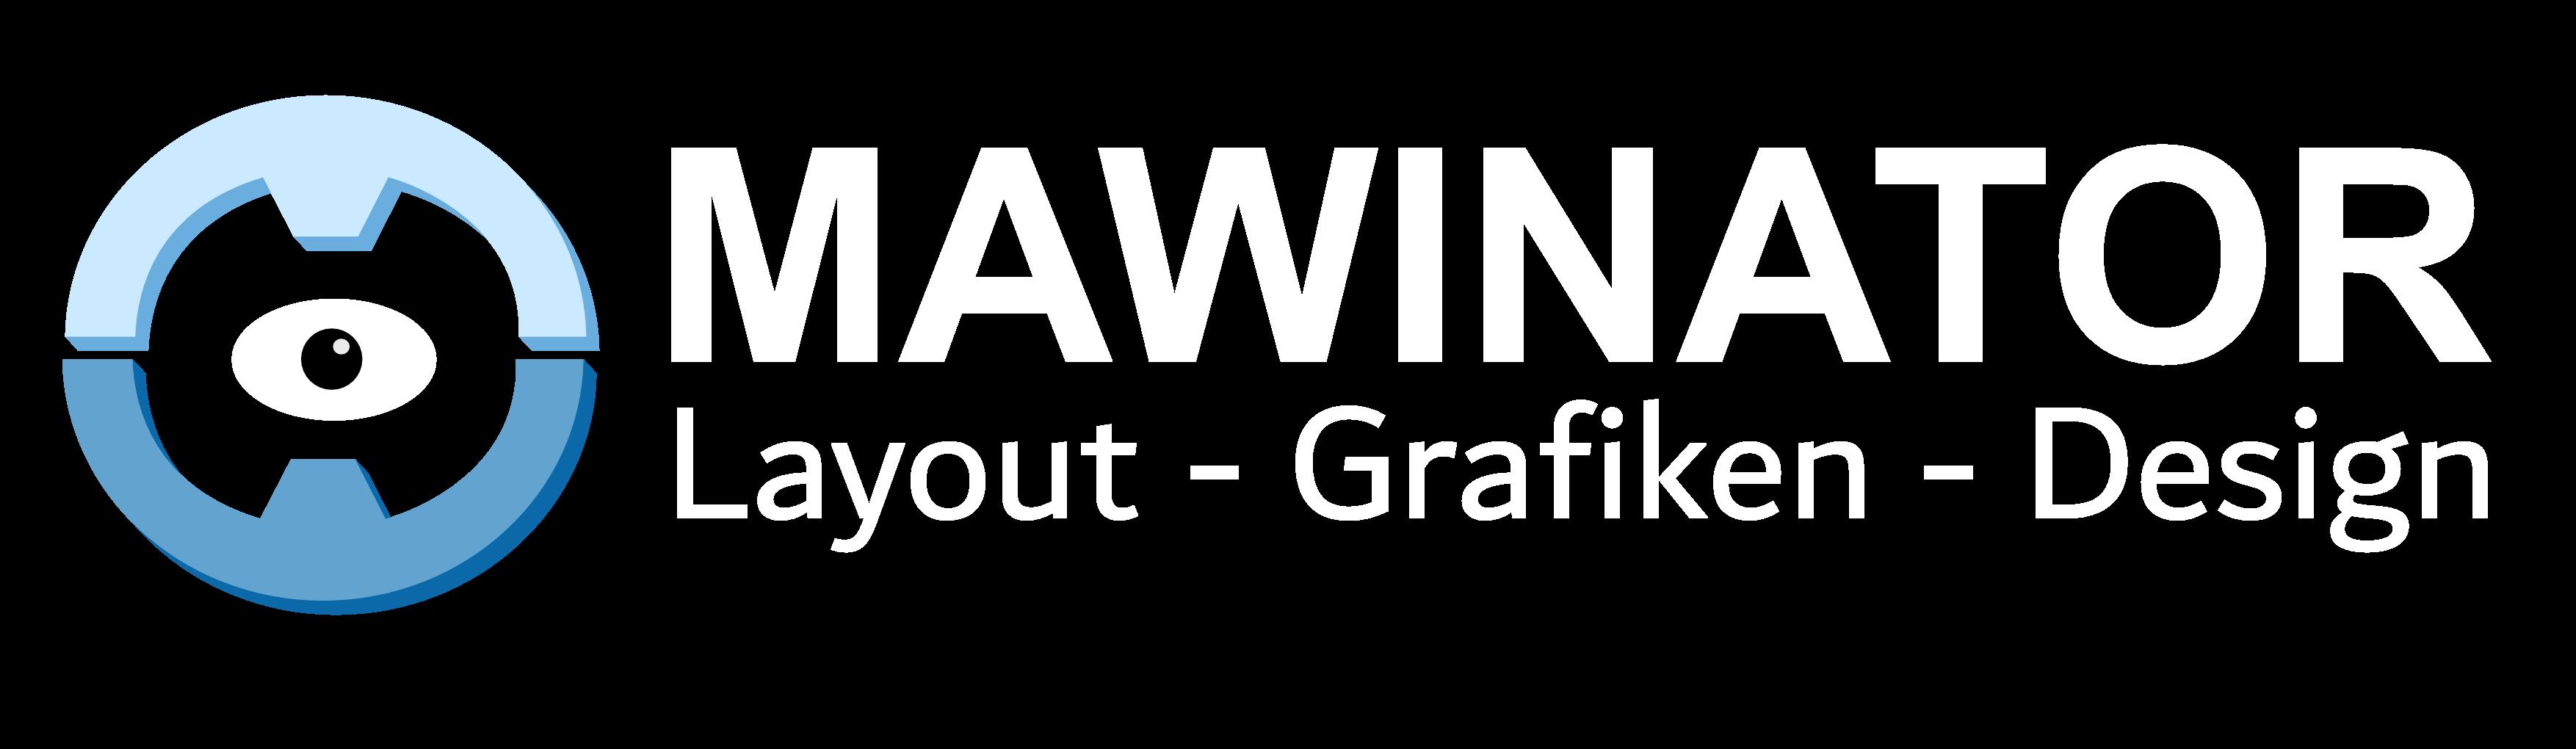 Mawinator